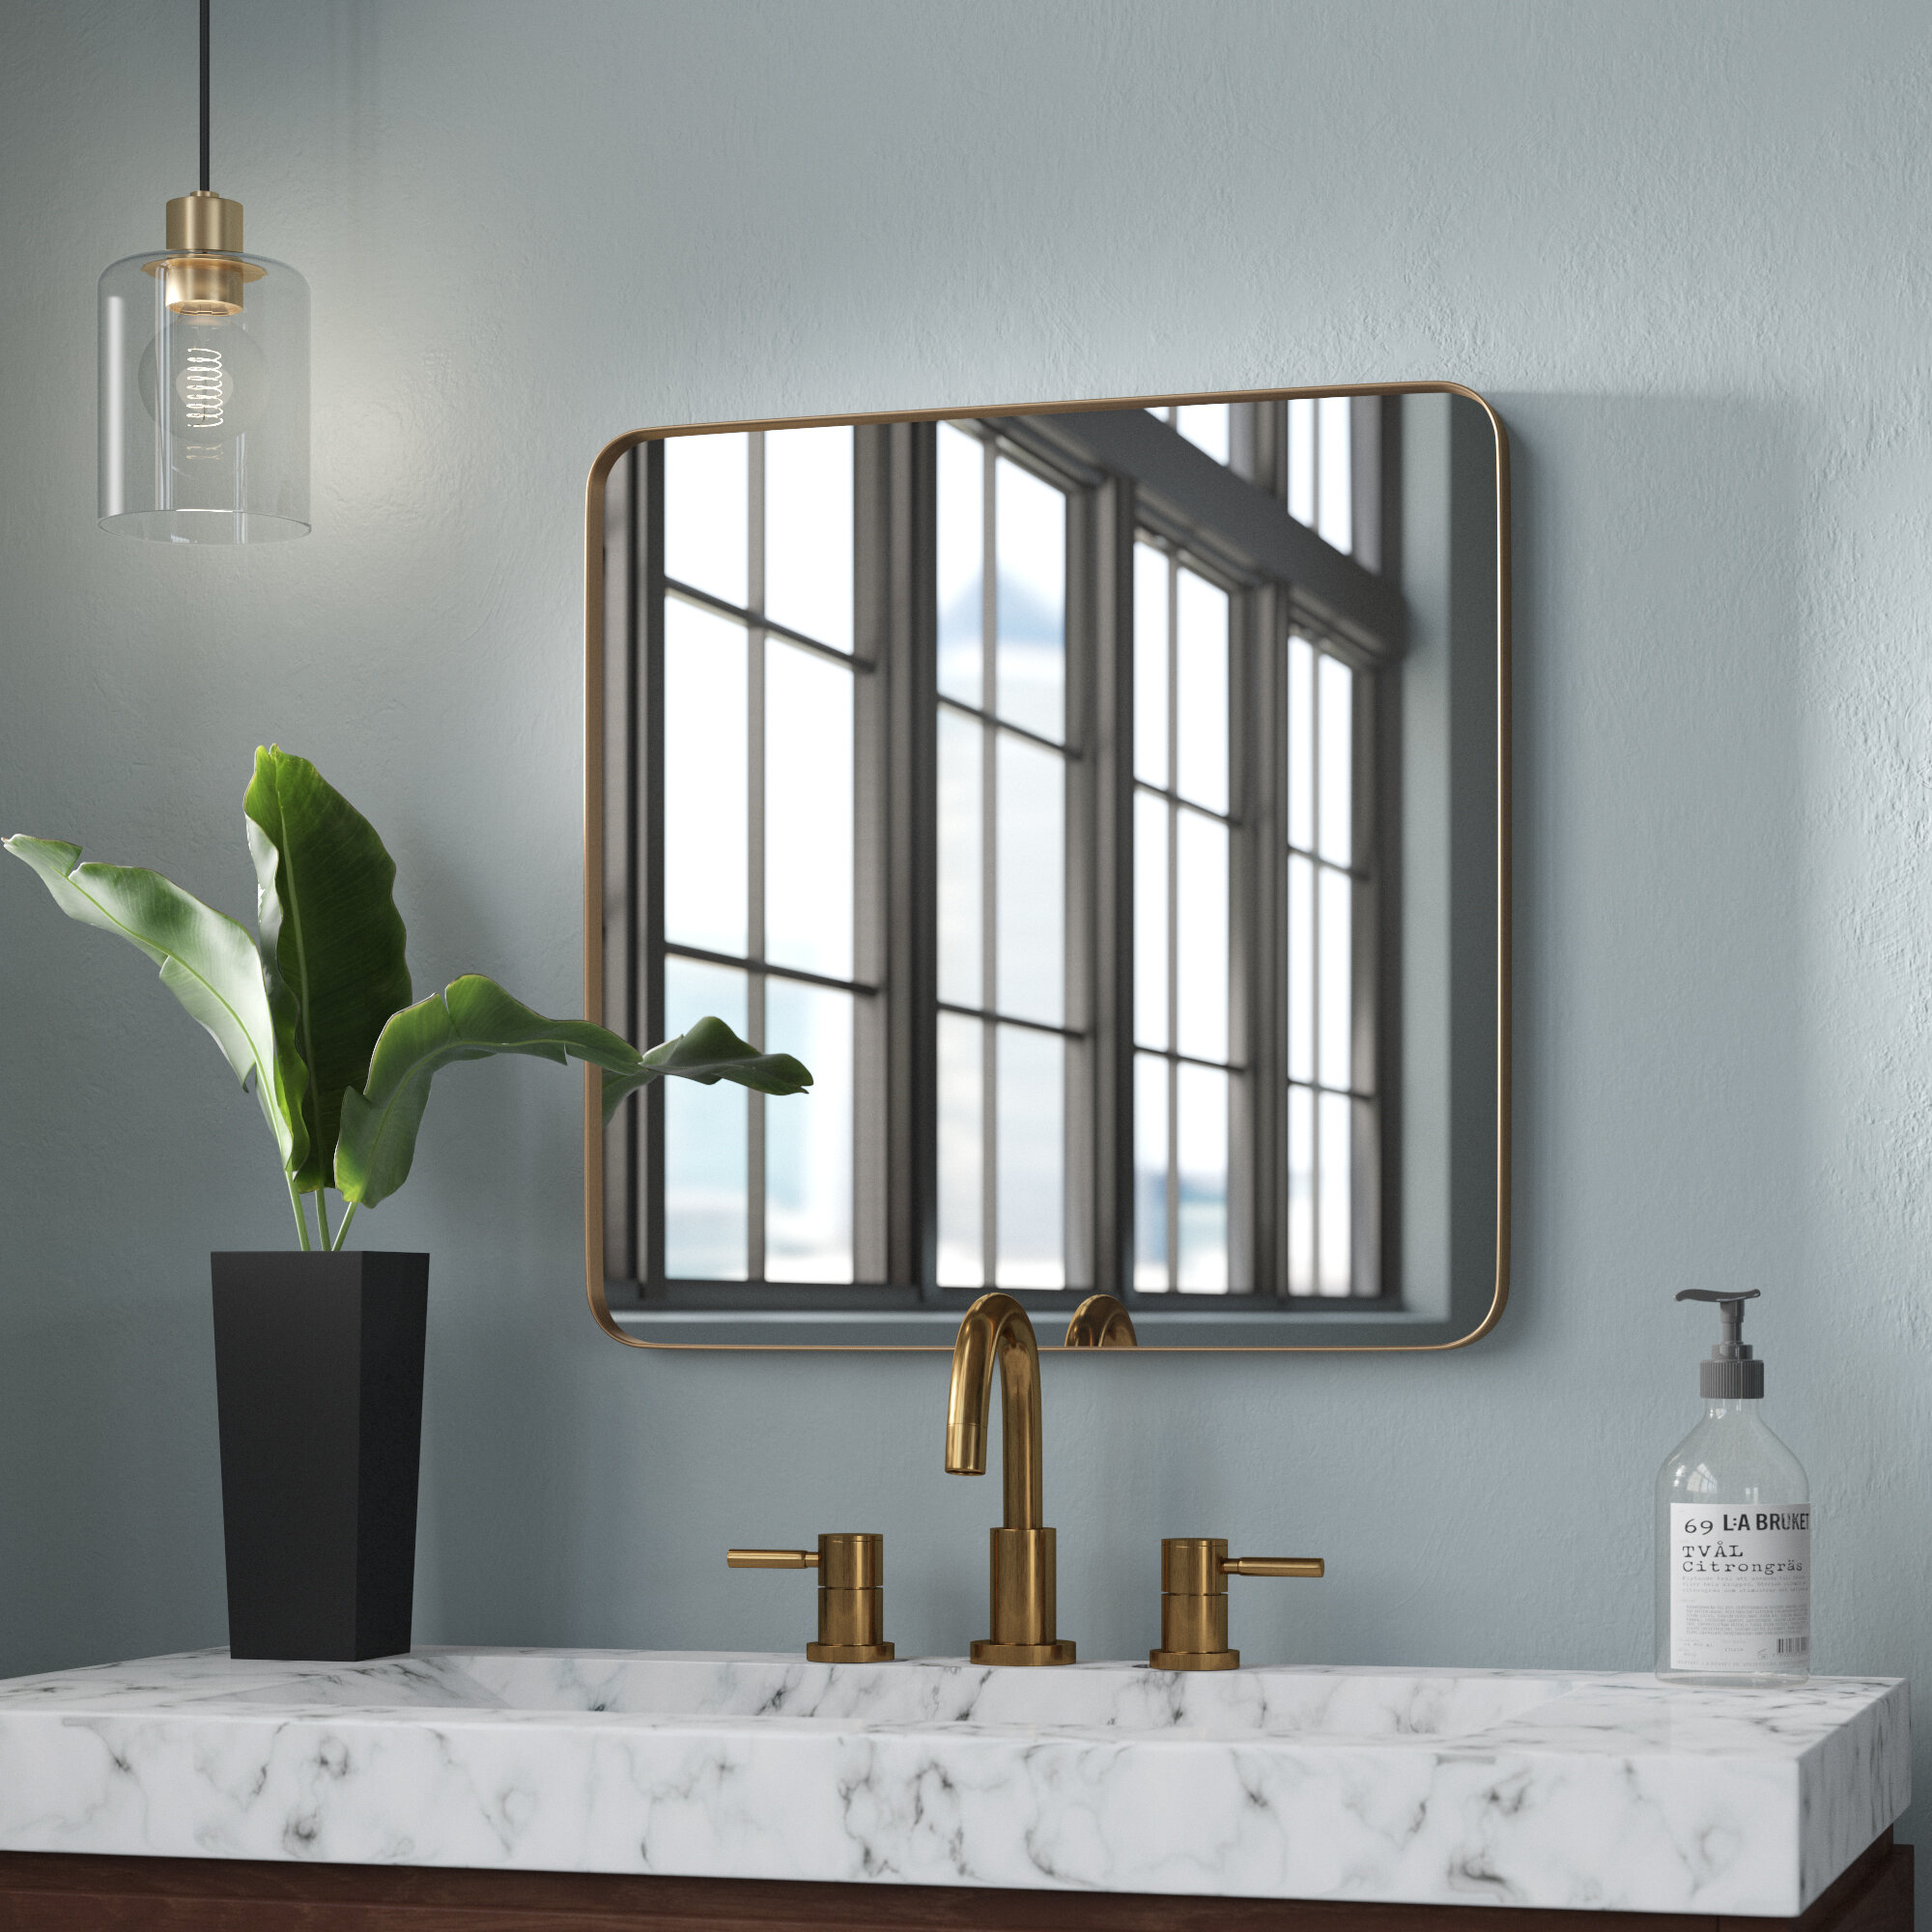 Morita Rectangle Metal Accent Mirror With Lugo Rectangle Accent Mirrors (Image 16 of 20)